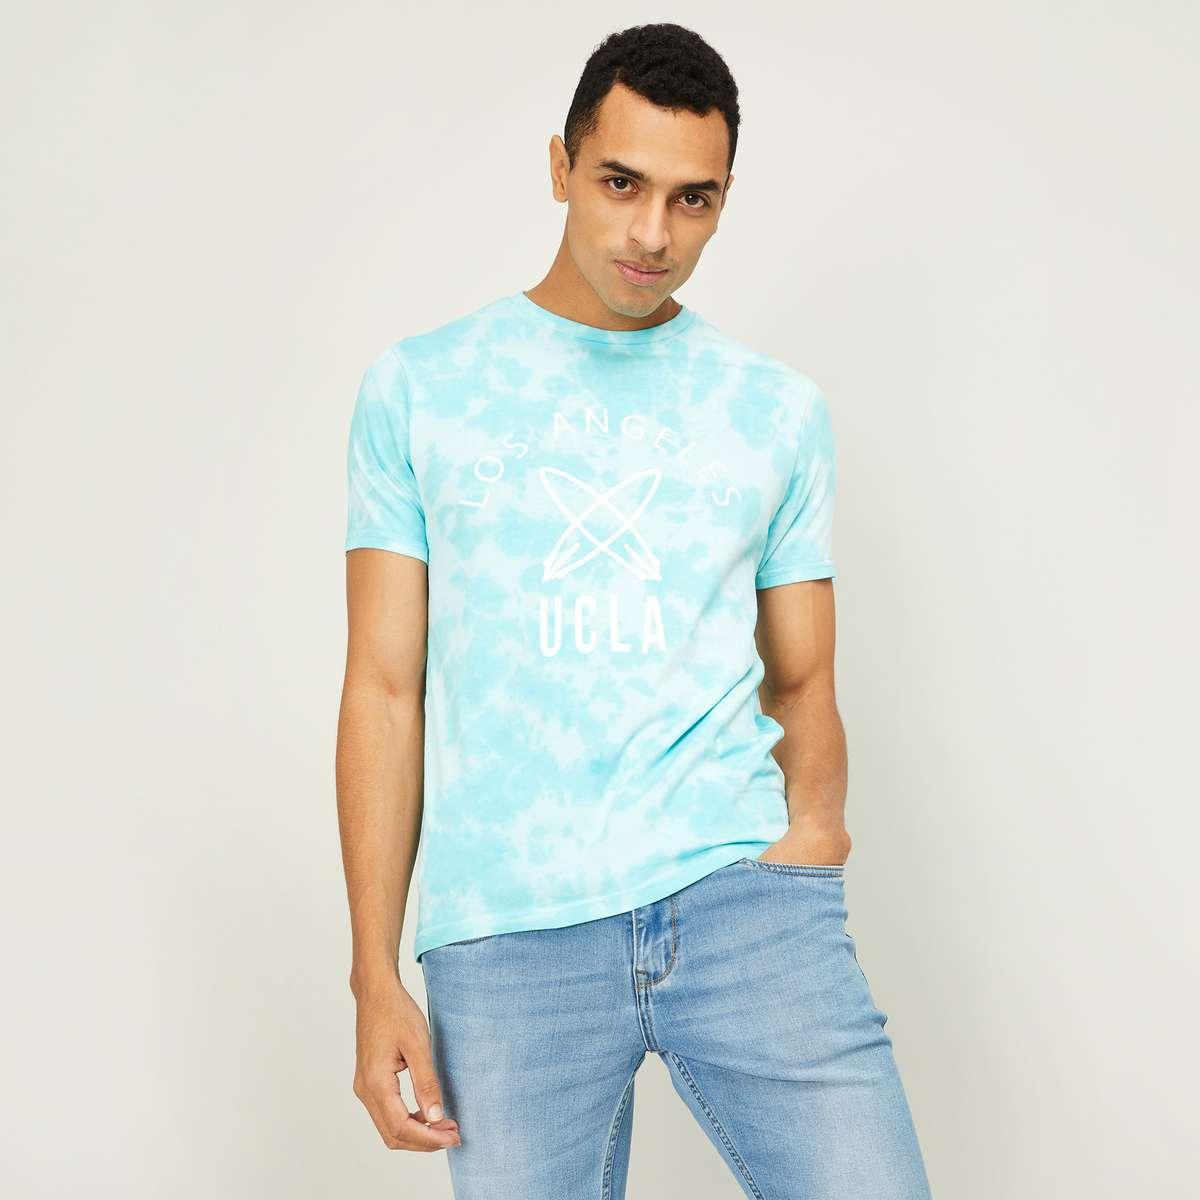 1.UCLA Men Printed Crew Neck T-Shirt